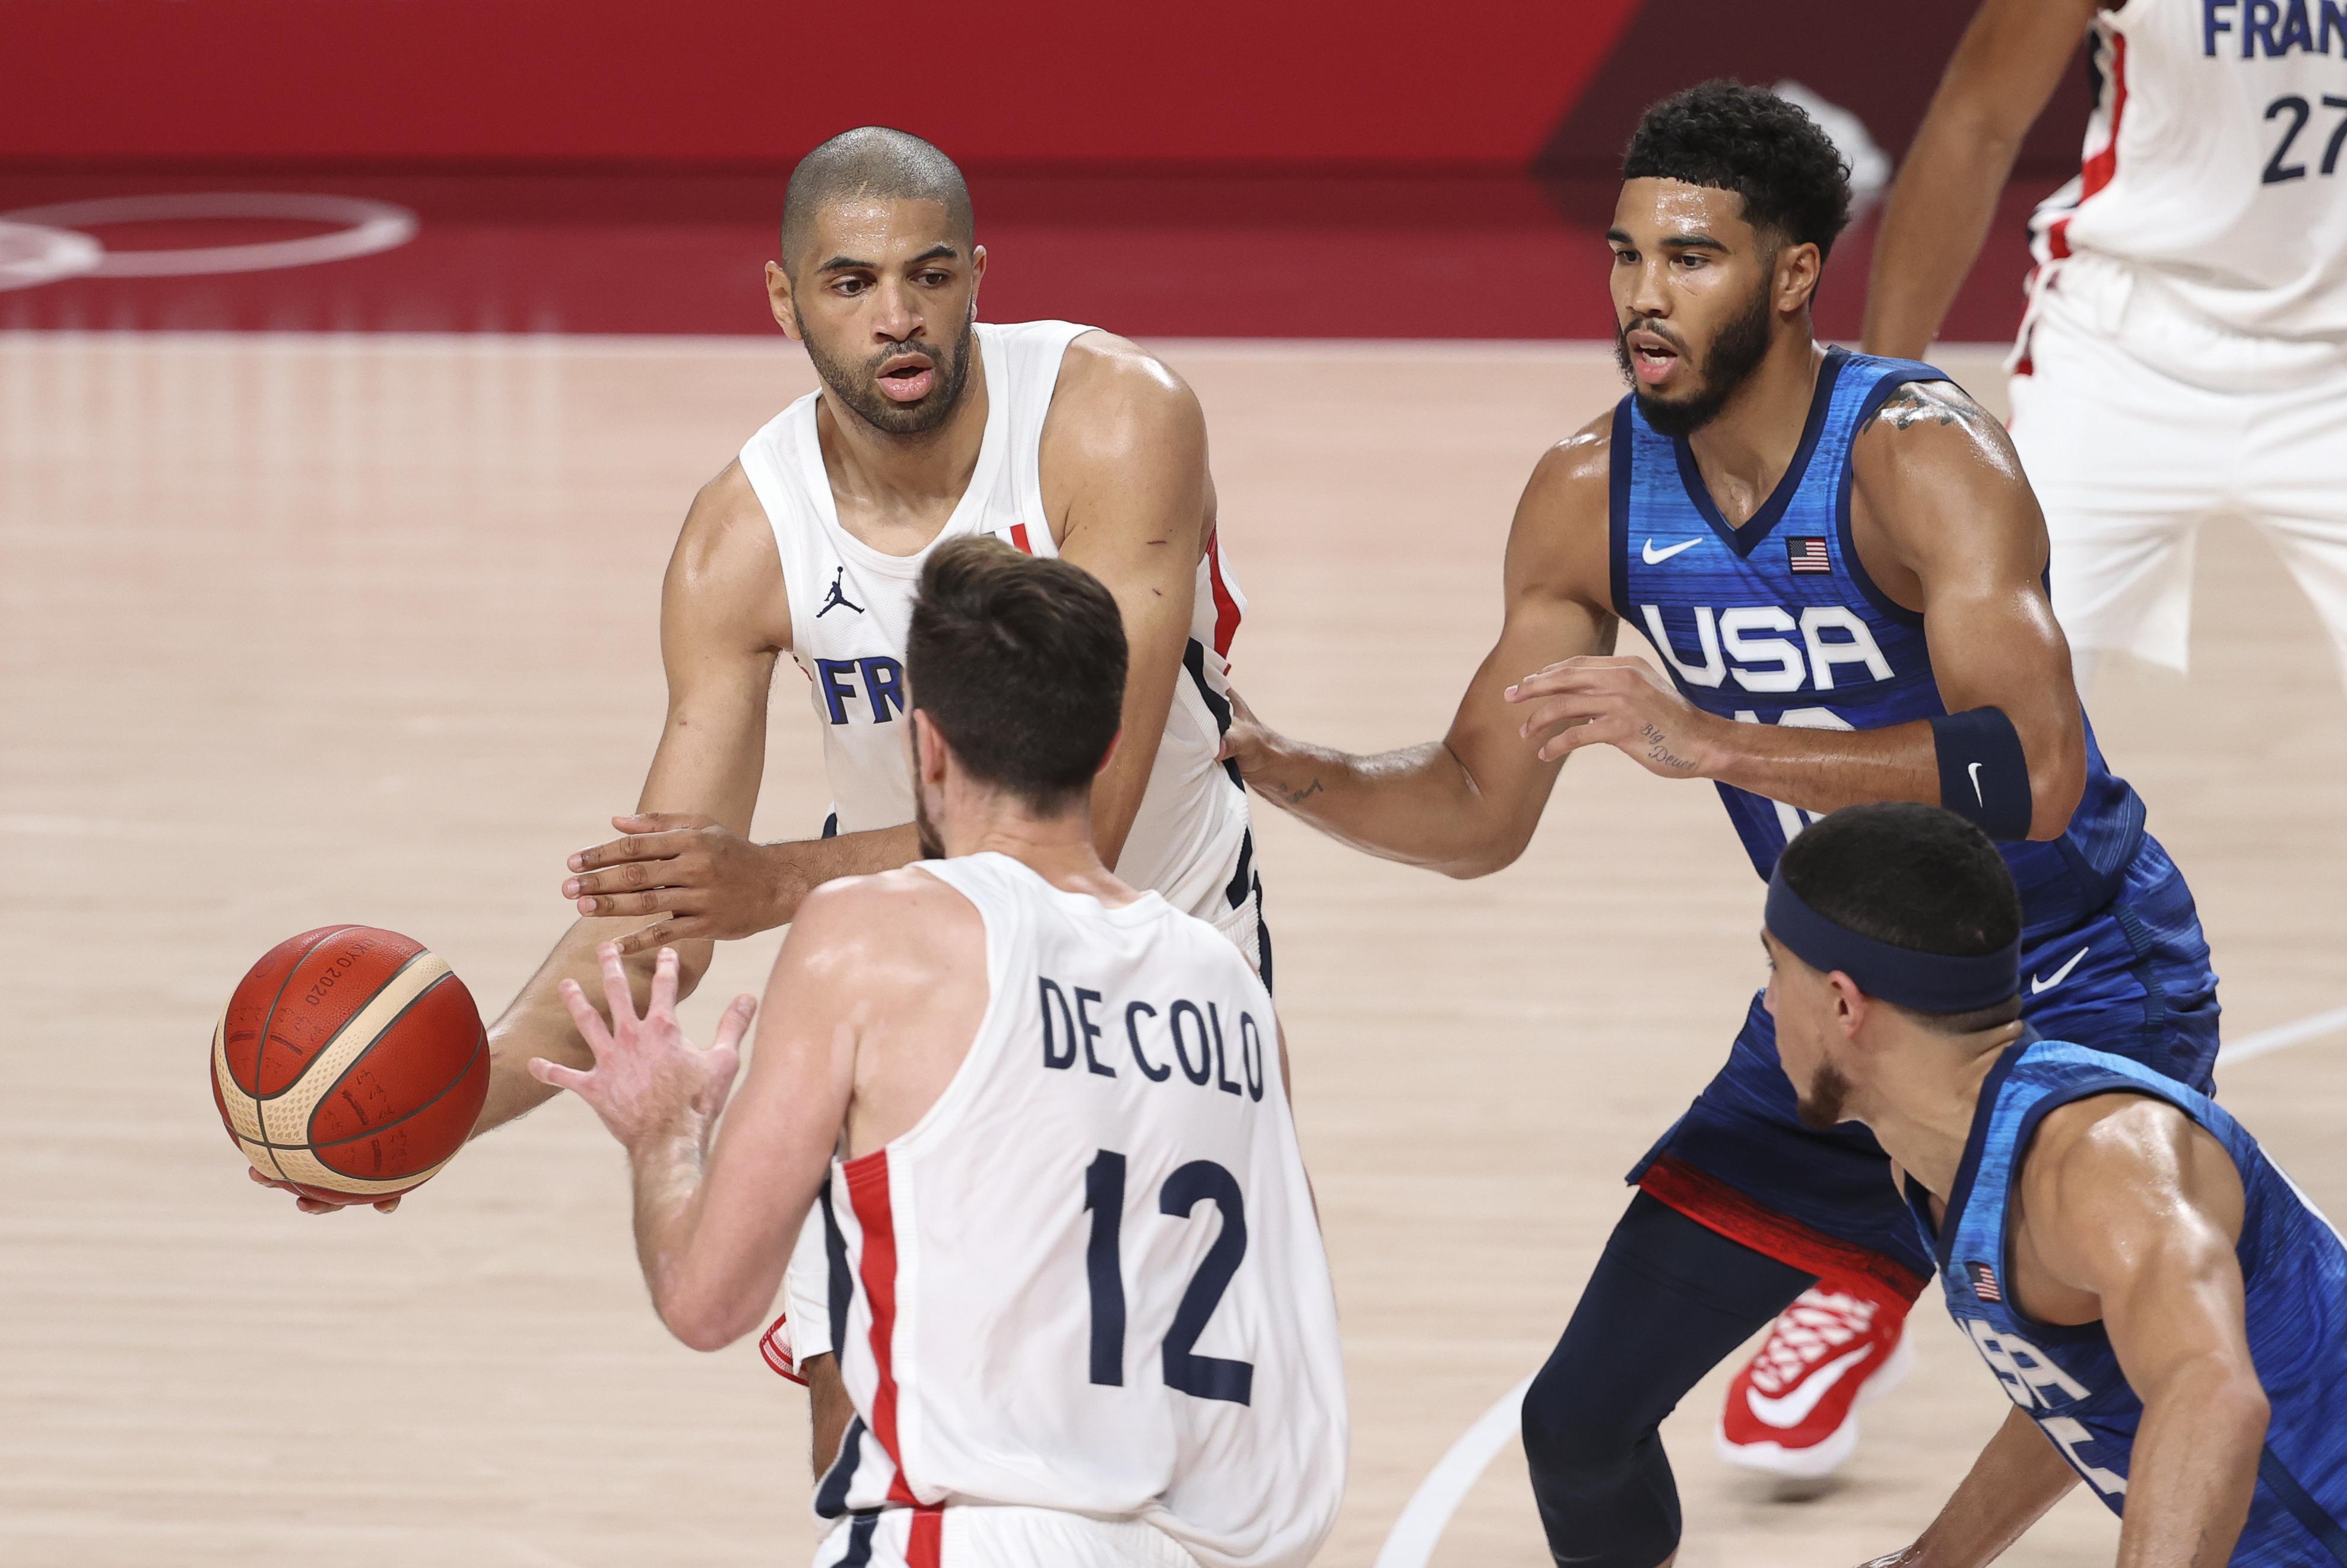 United States v France Men's Basketball - Olympics: Day 2